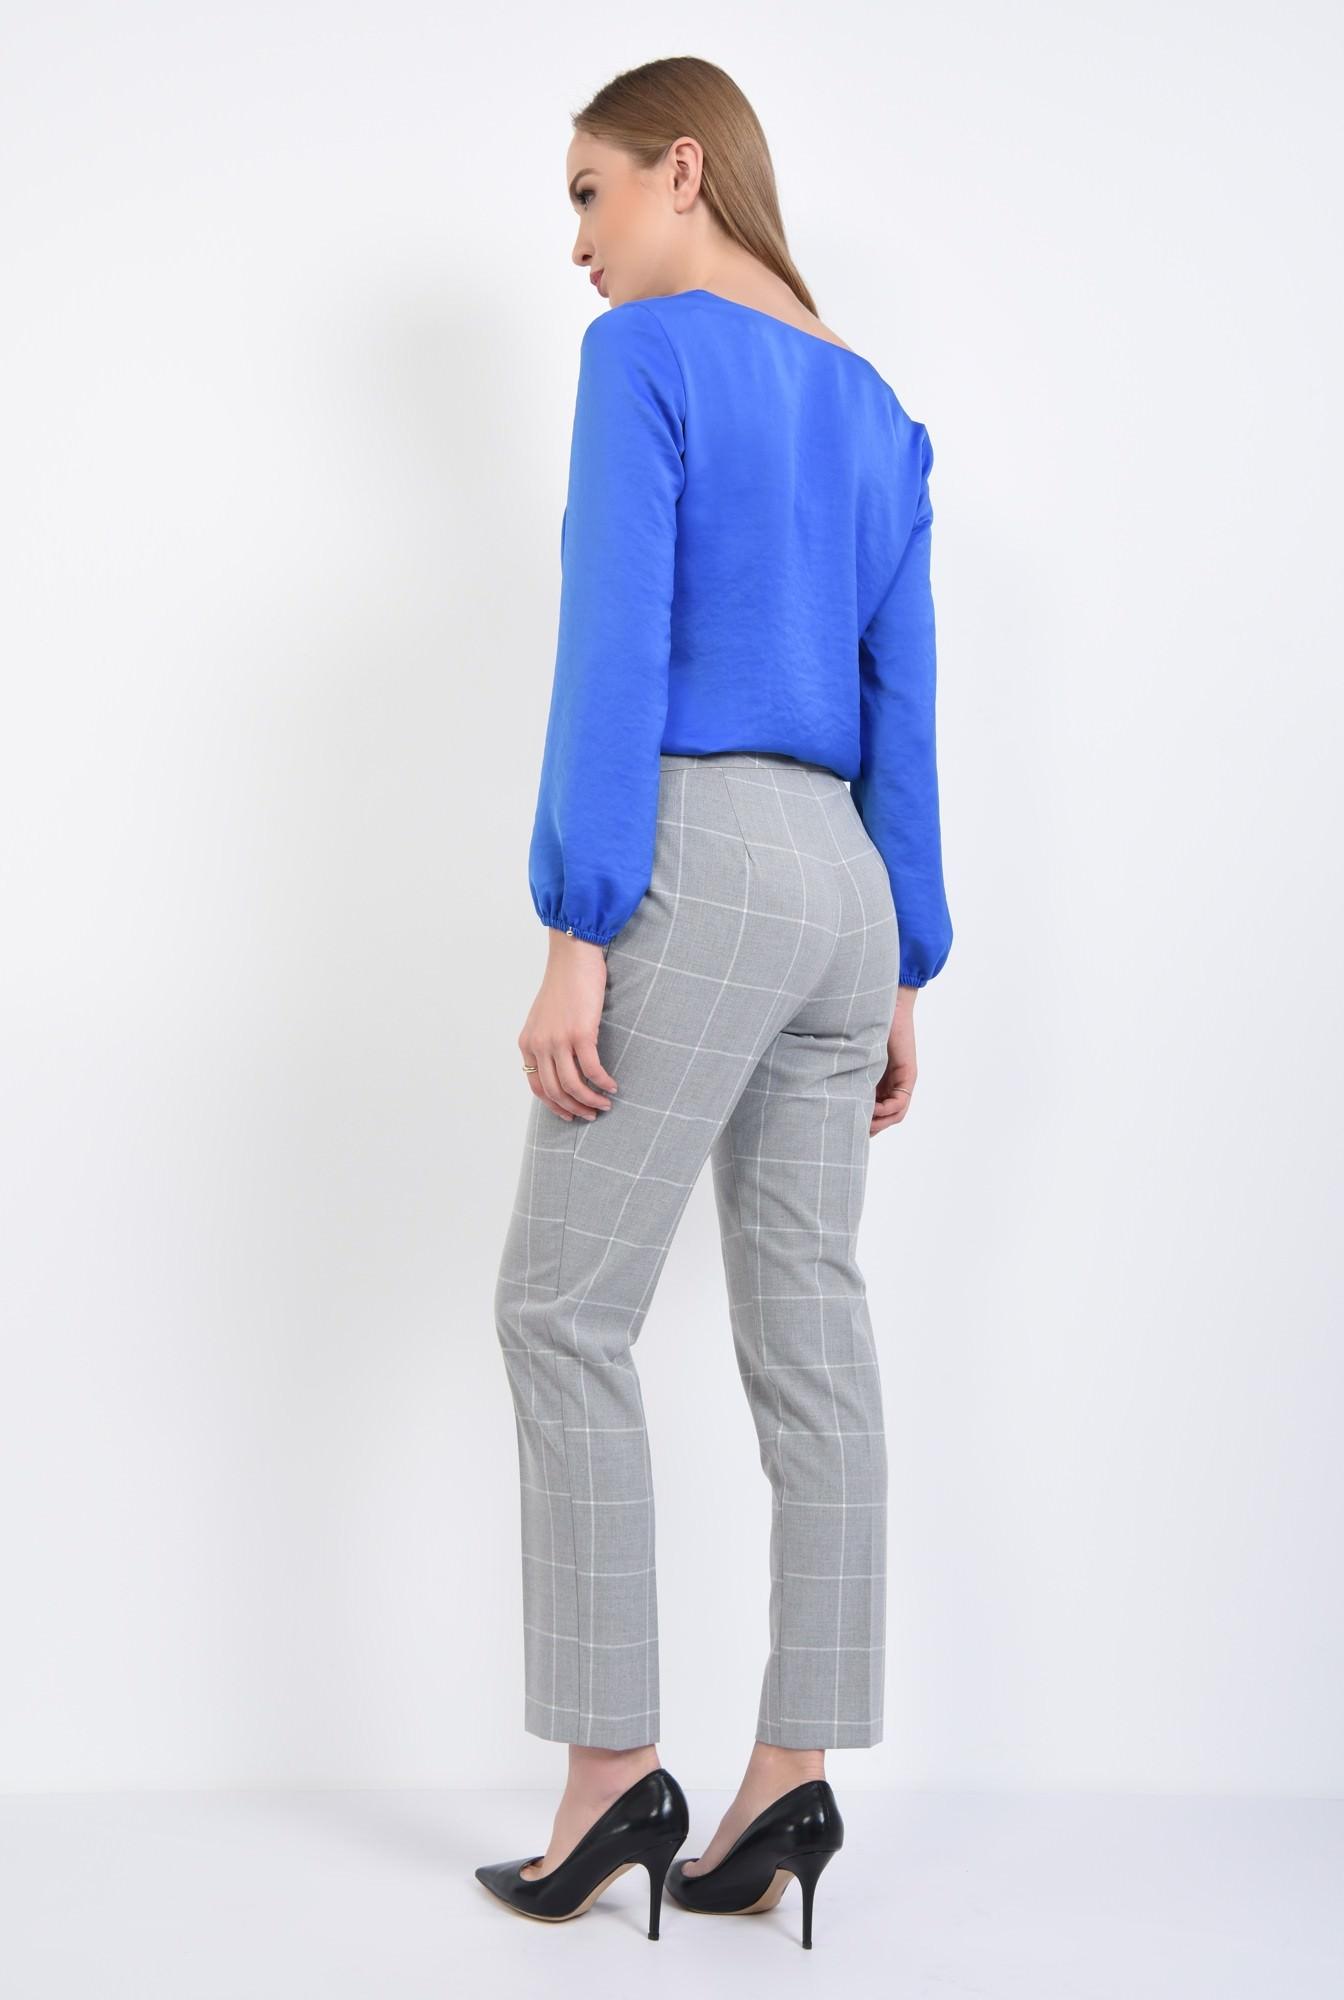 1 - Pantaloni casual, imprimeu